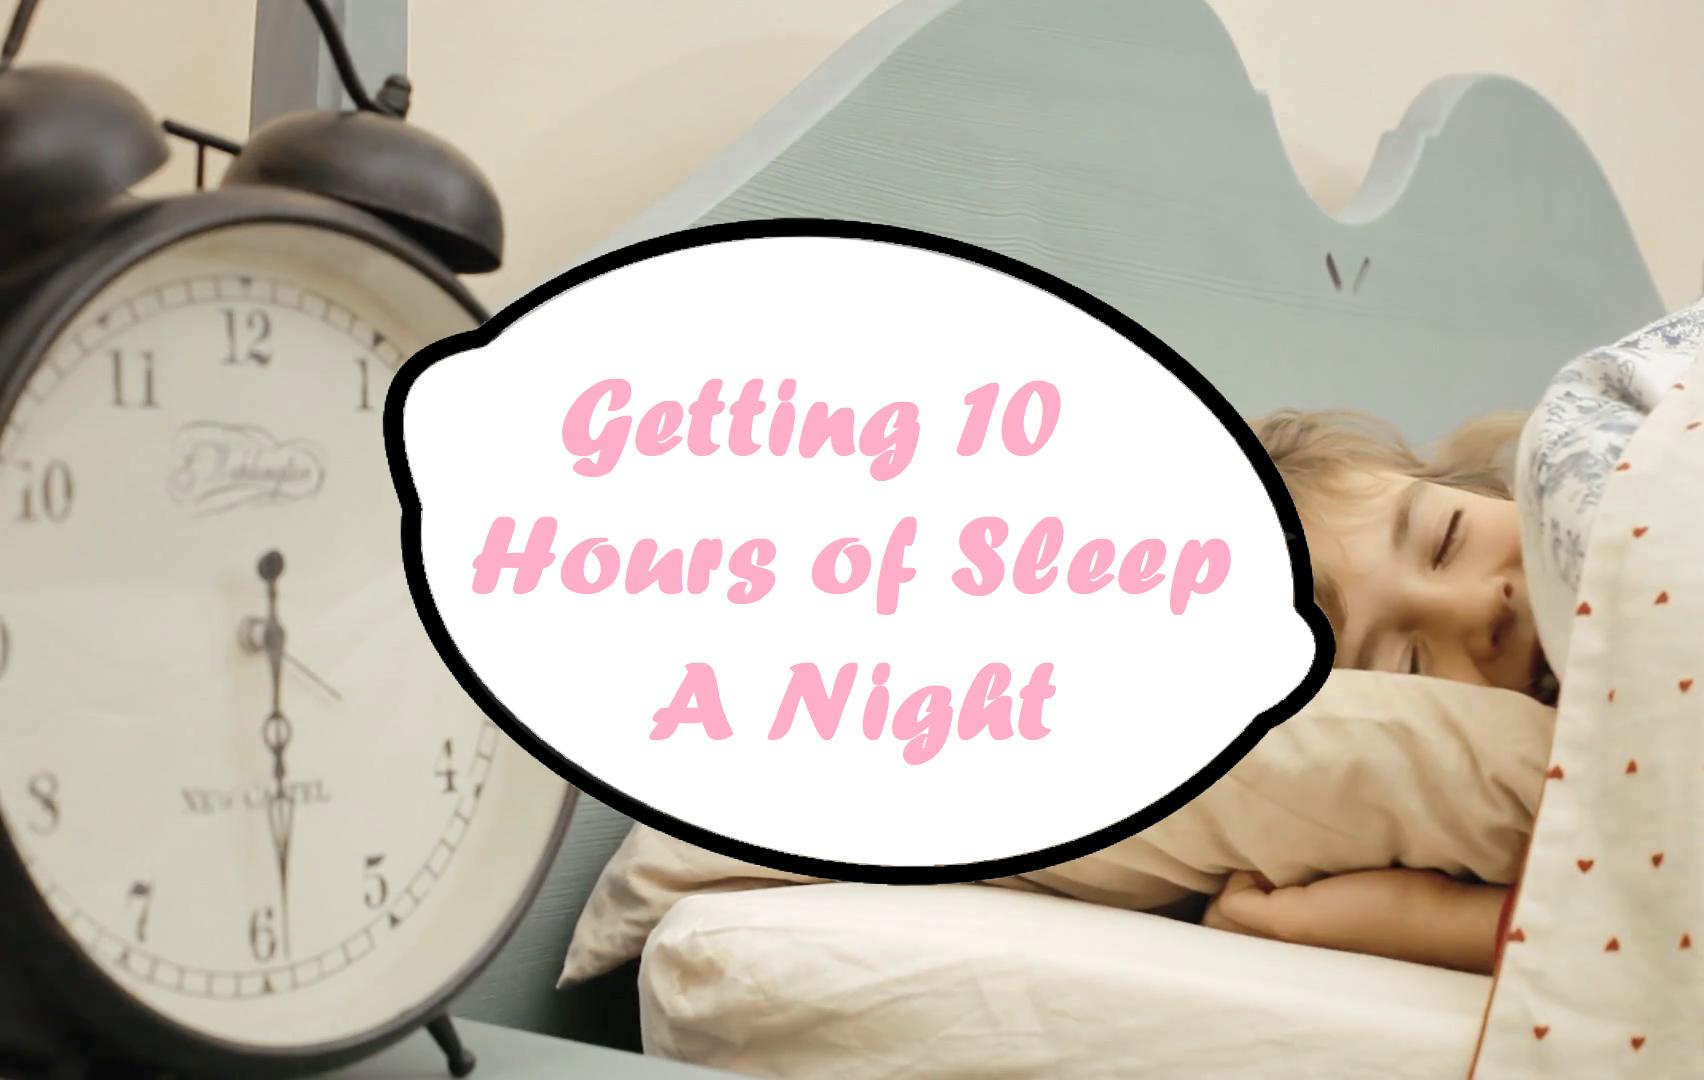 Getting 10 Hours of Sleep a Night